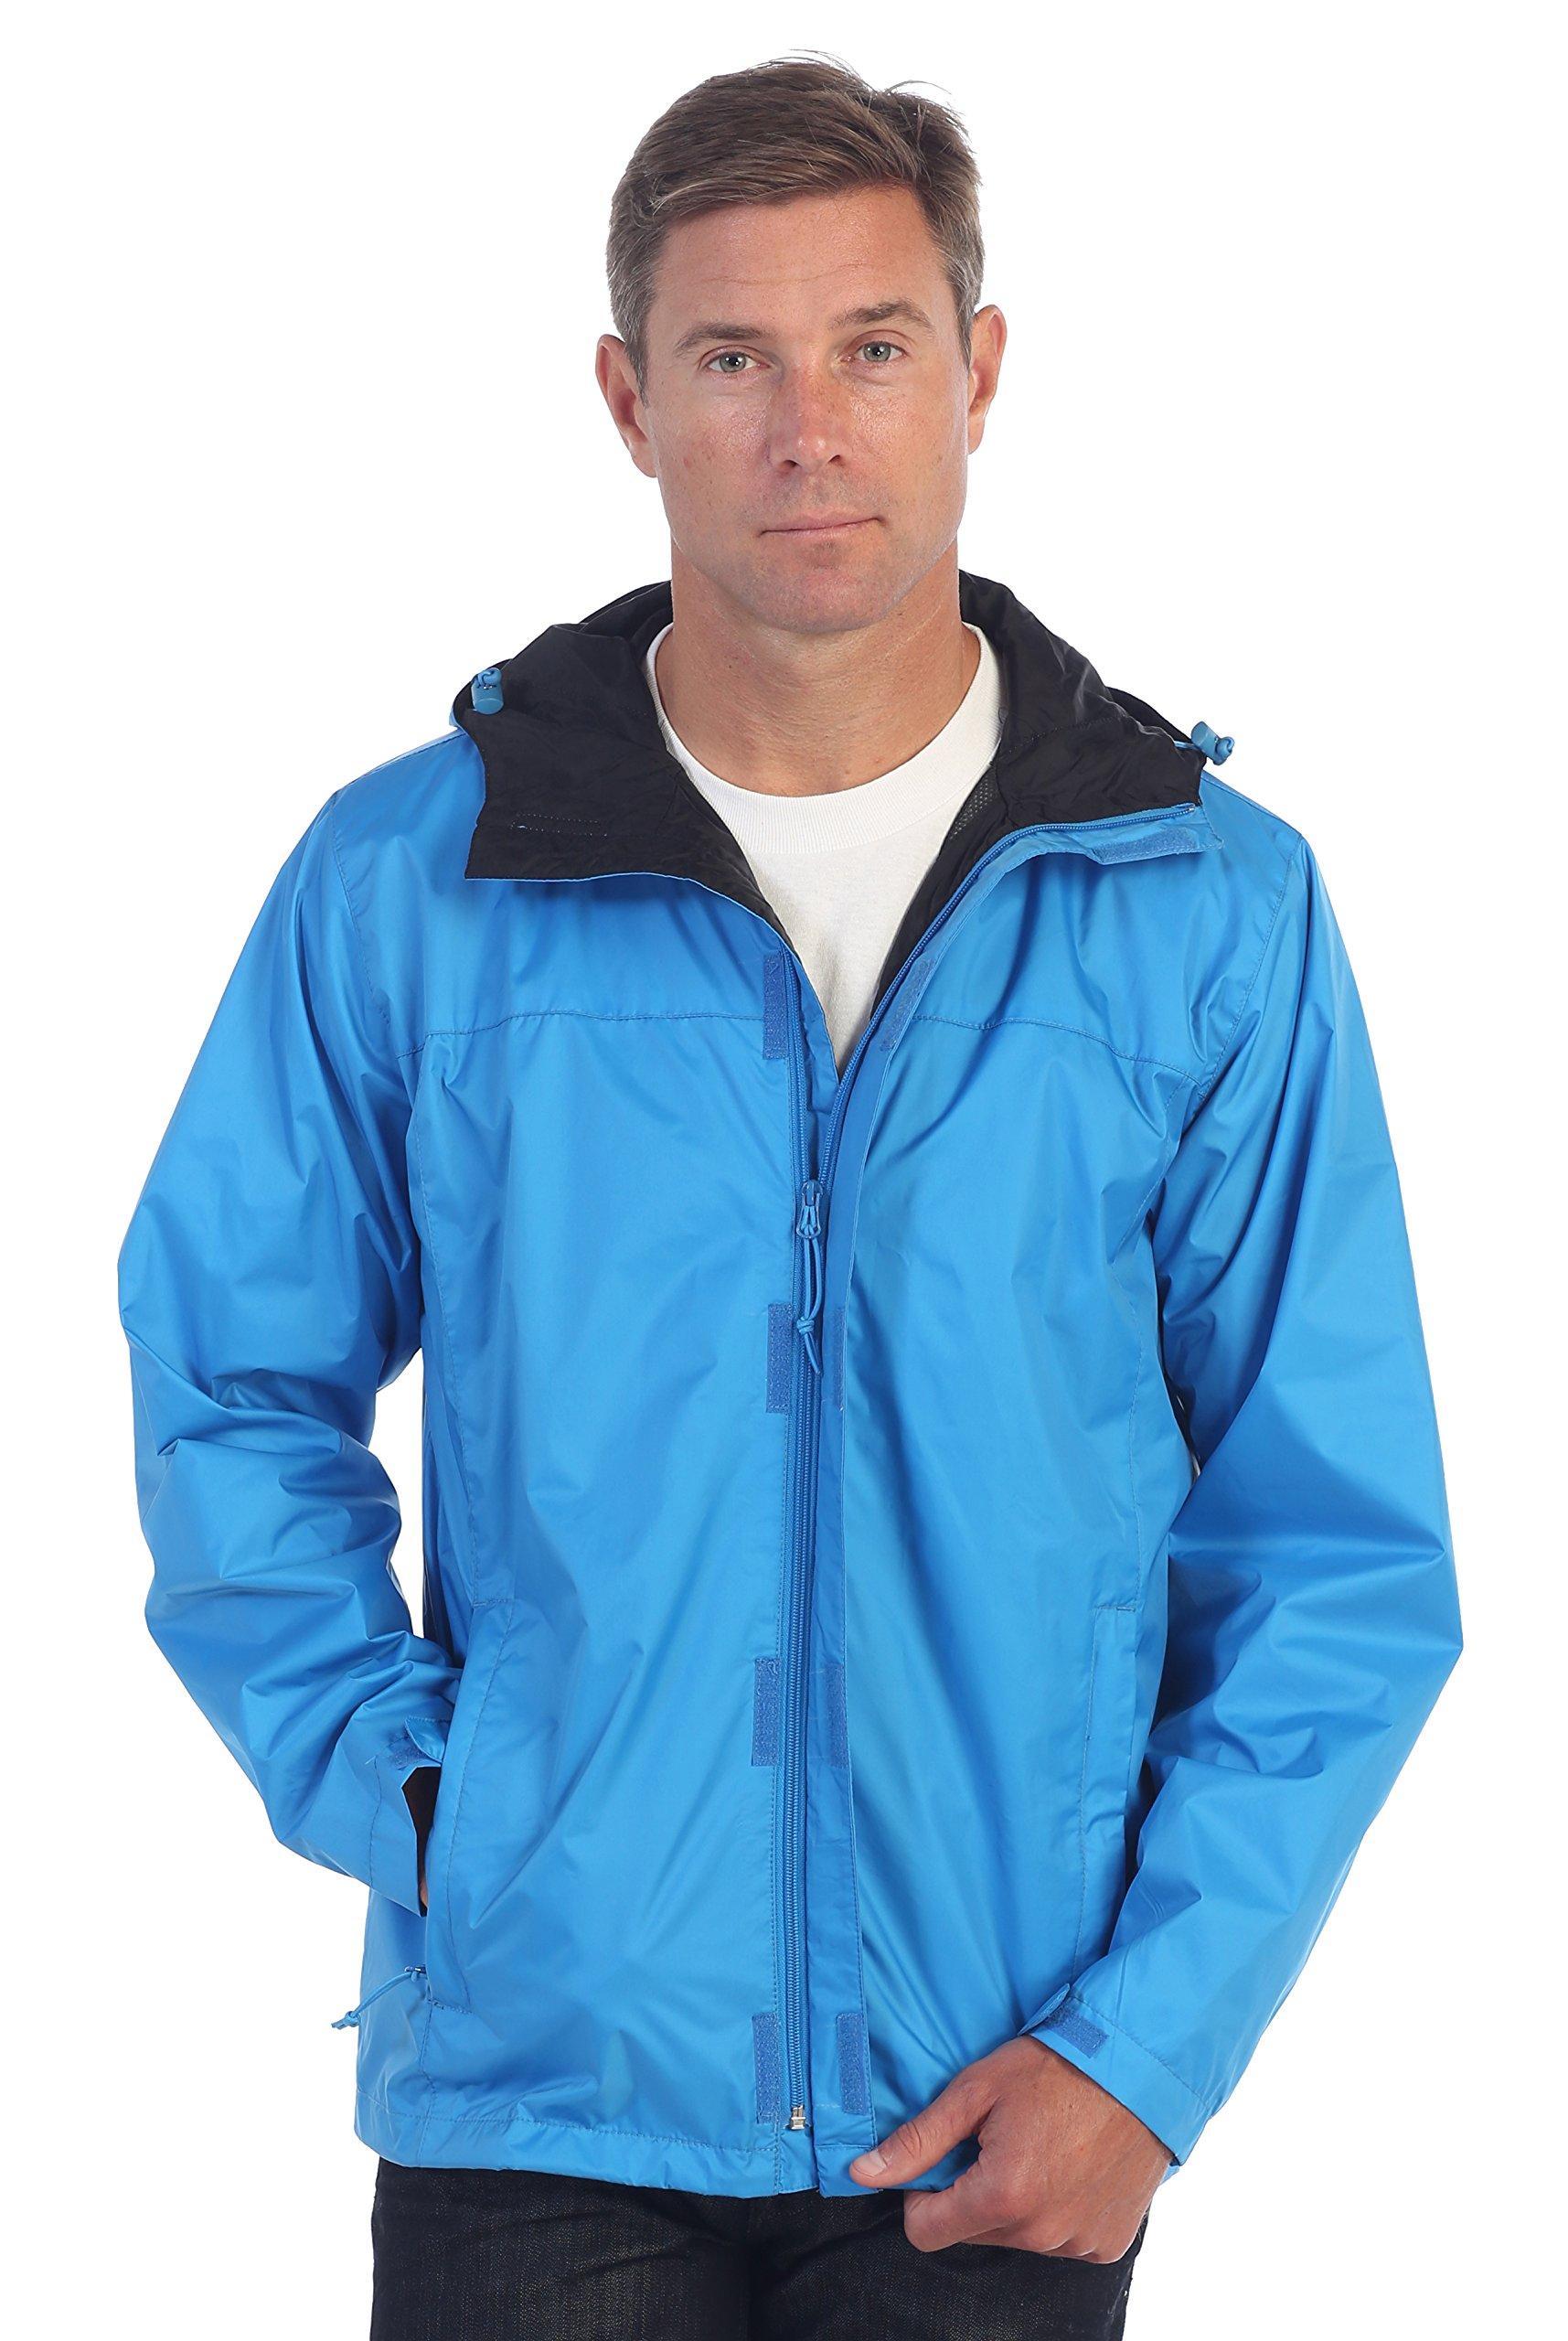 Gioberti Men's Waterproof Rain Jacket, Turquoise, S